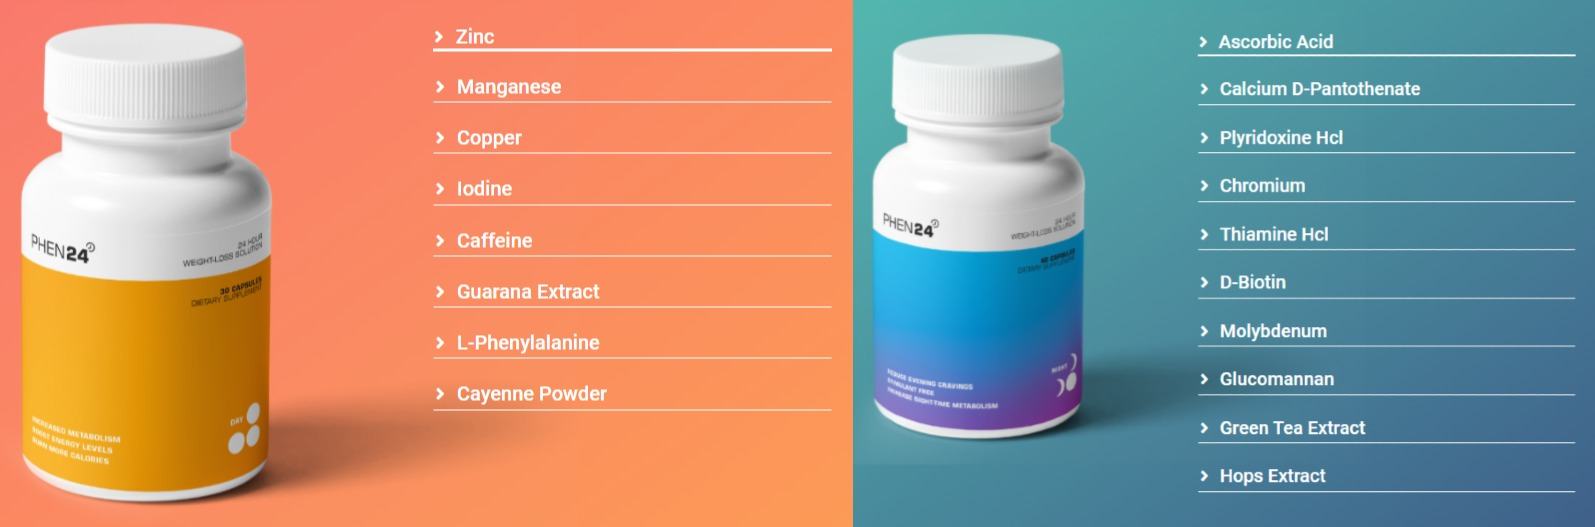 Phen24 Ingredients Label